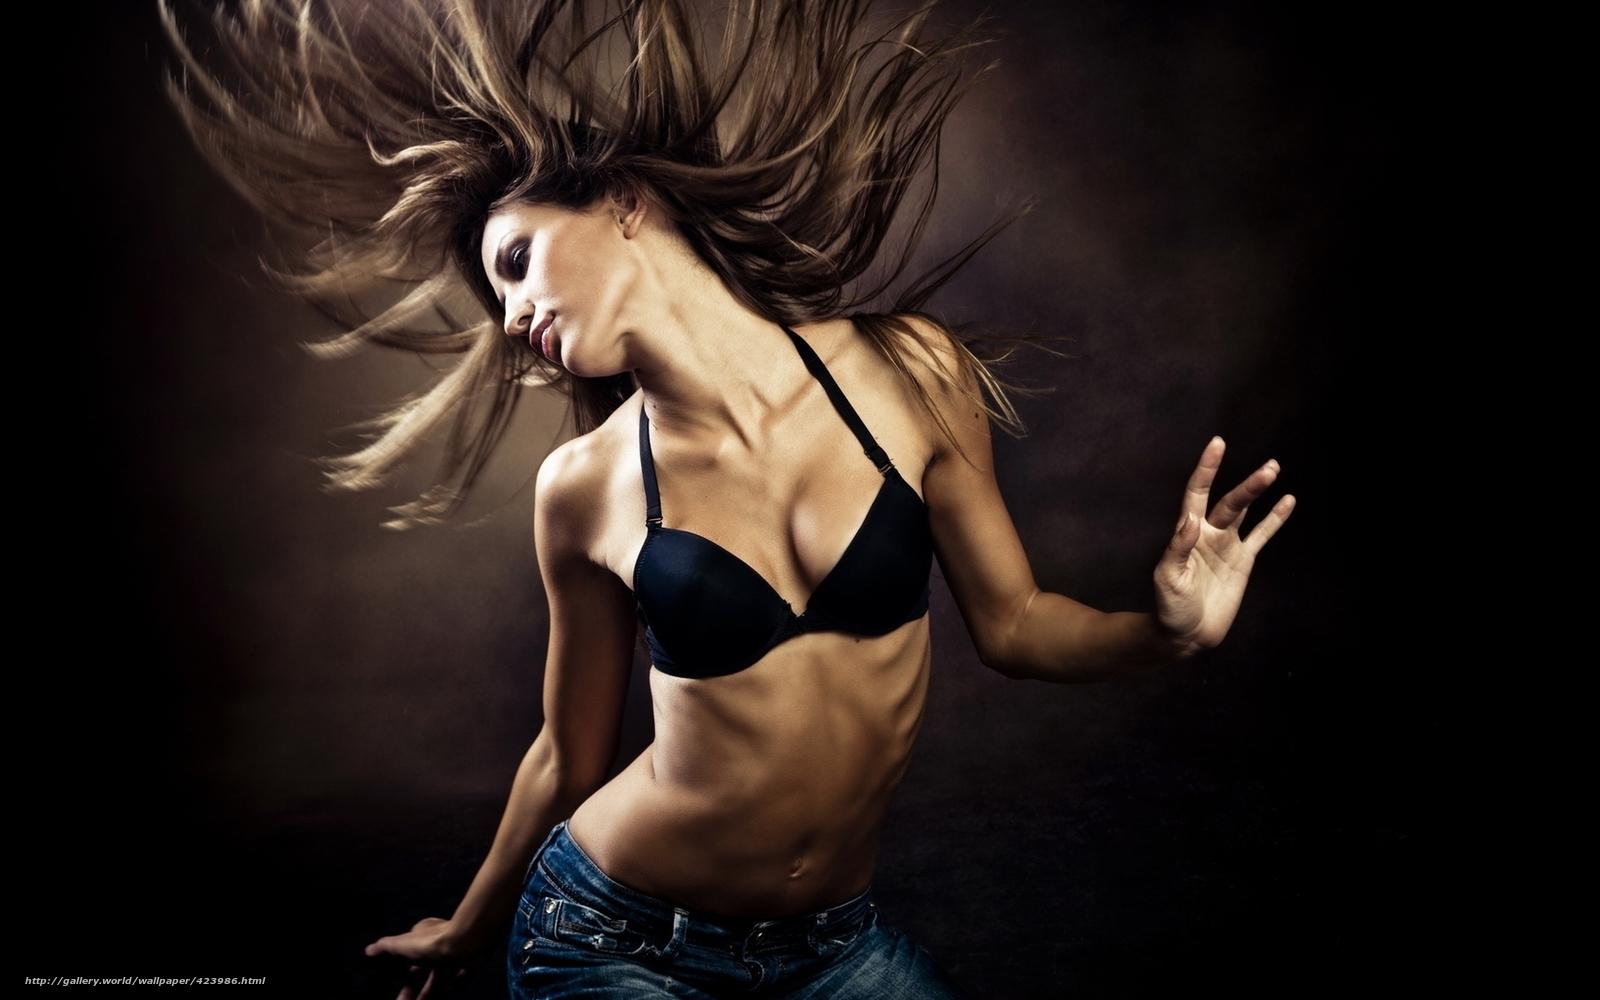 Фото блондинка и брюнетка танцуют 25 фотография